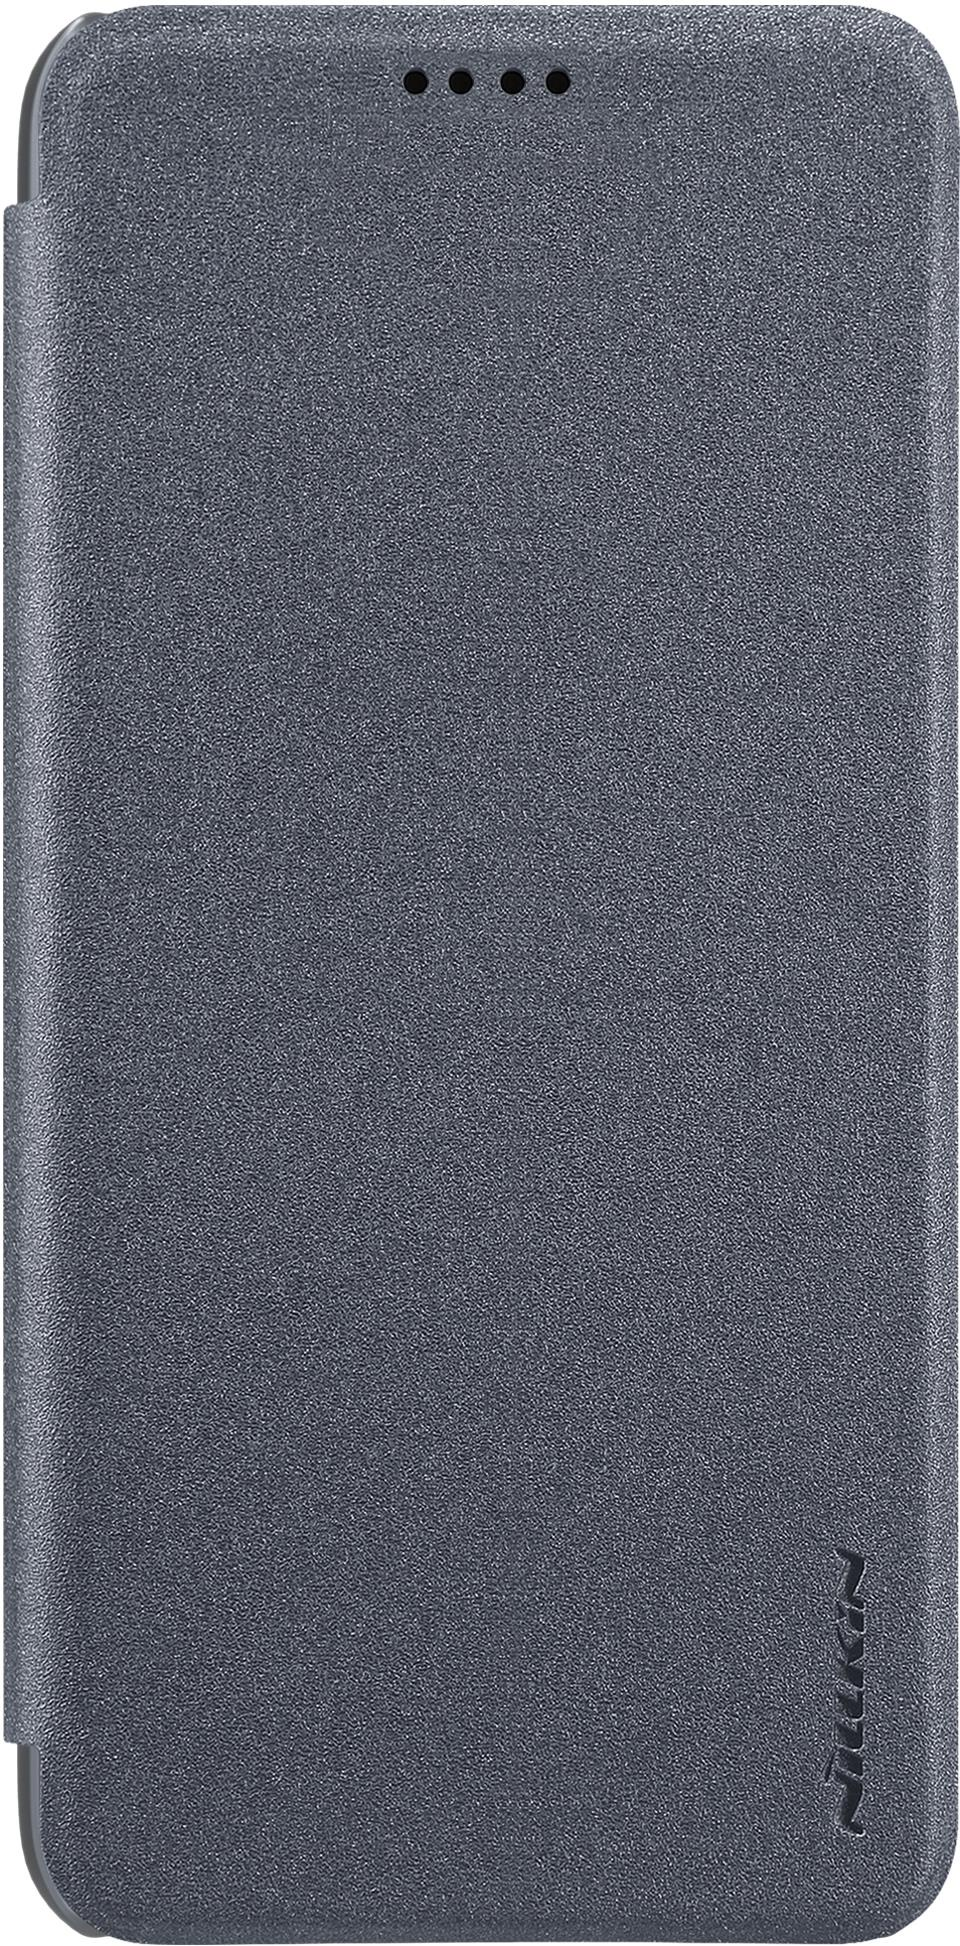 Чехол-книжка Nillkin Sparkle для Honor 10, 6902048157521, черный цена